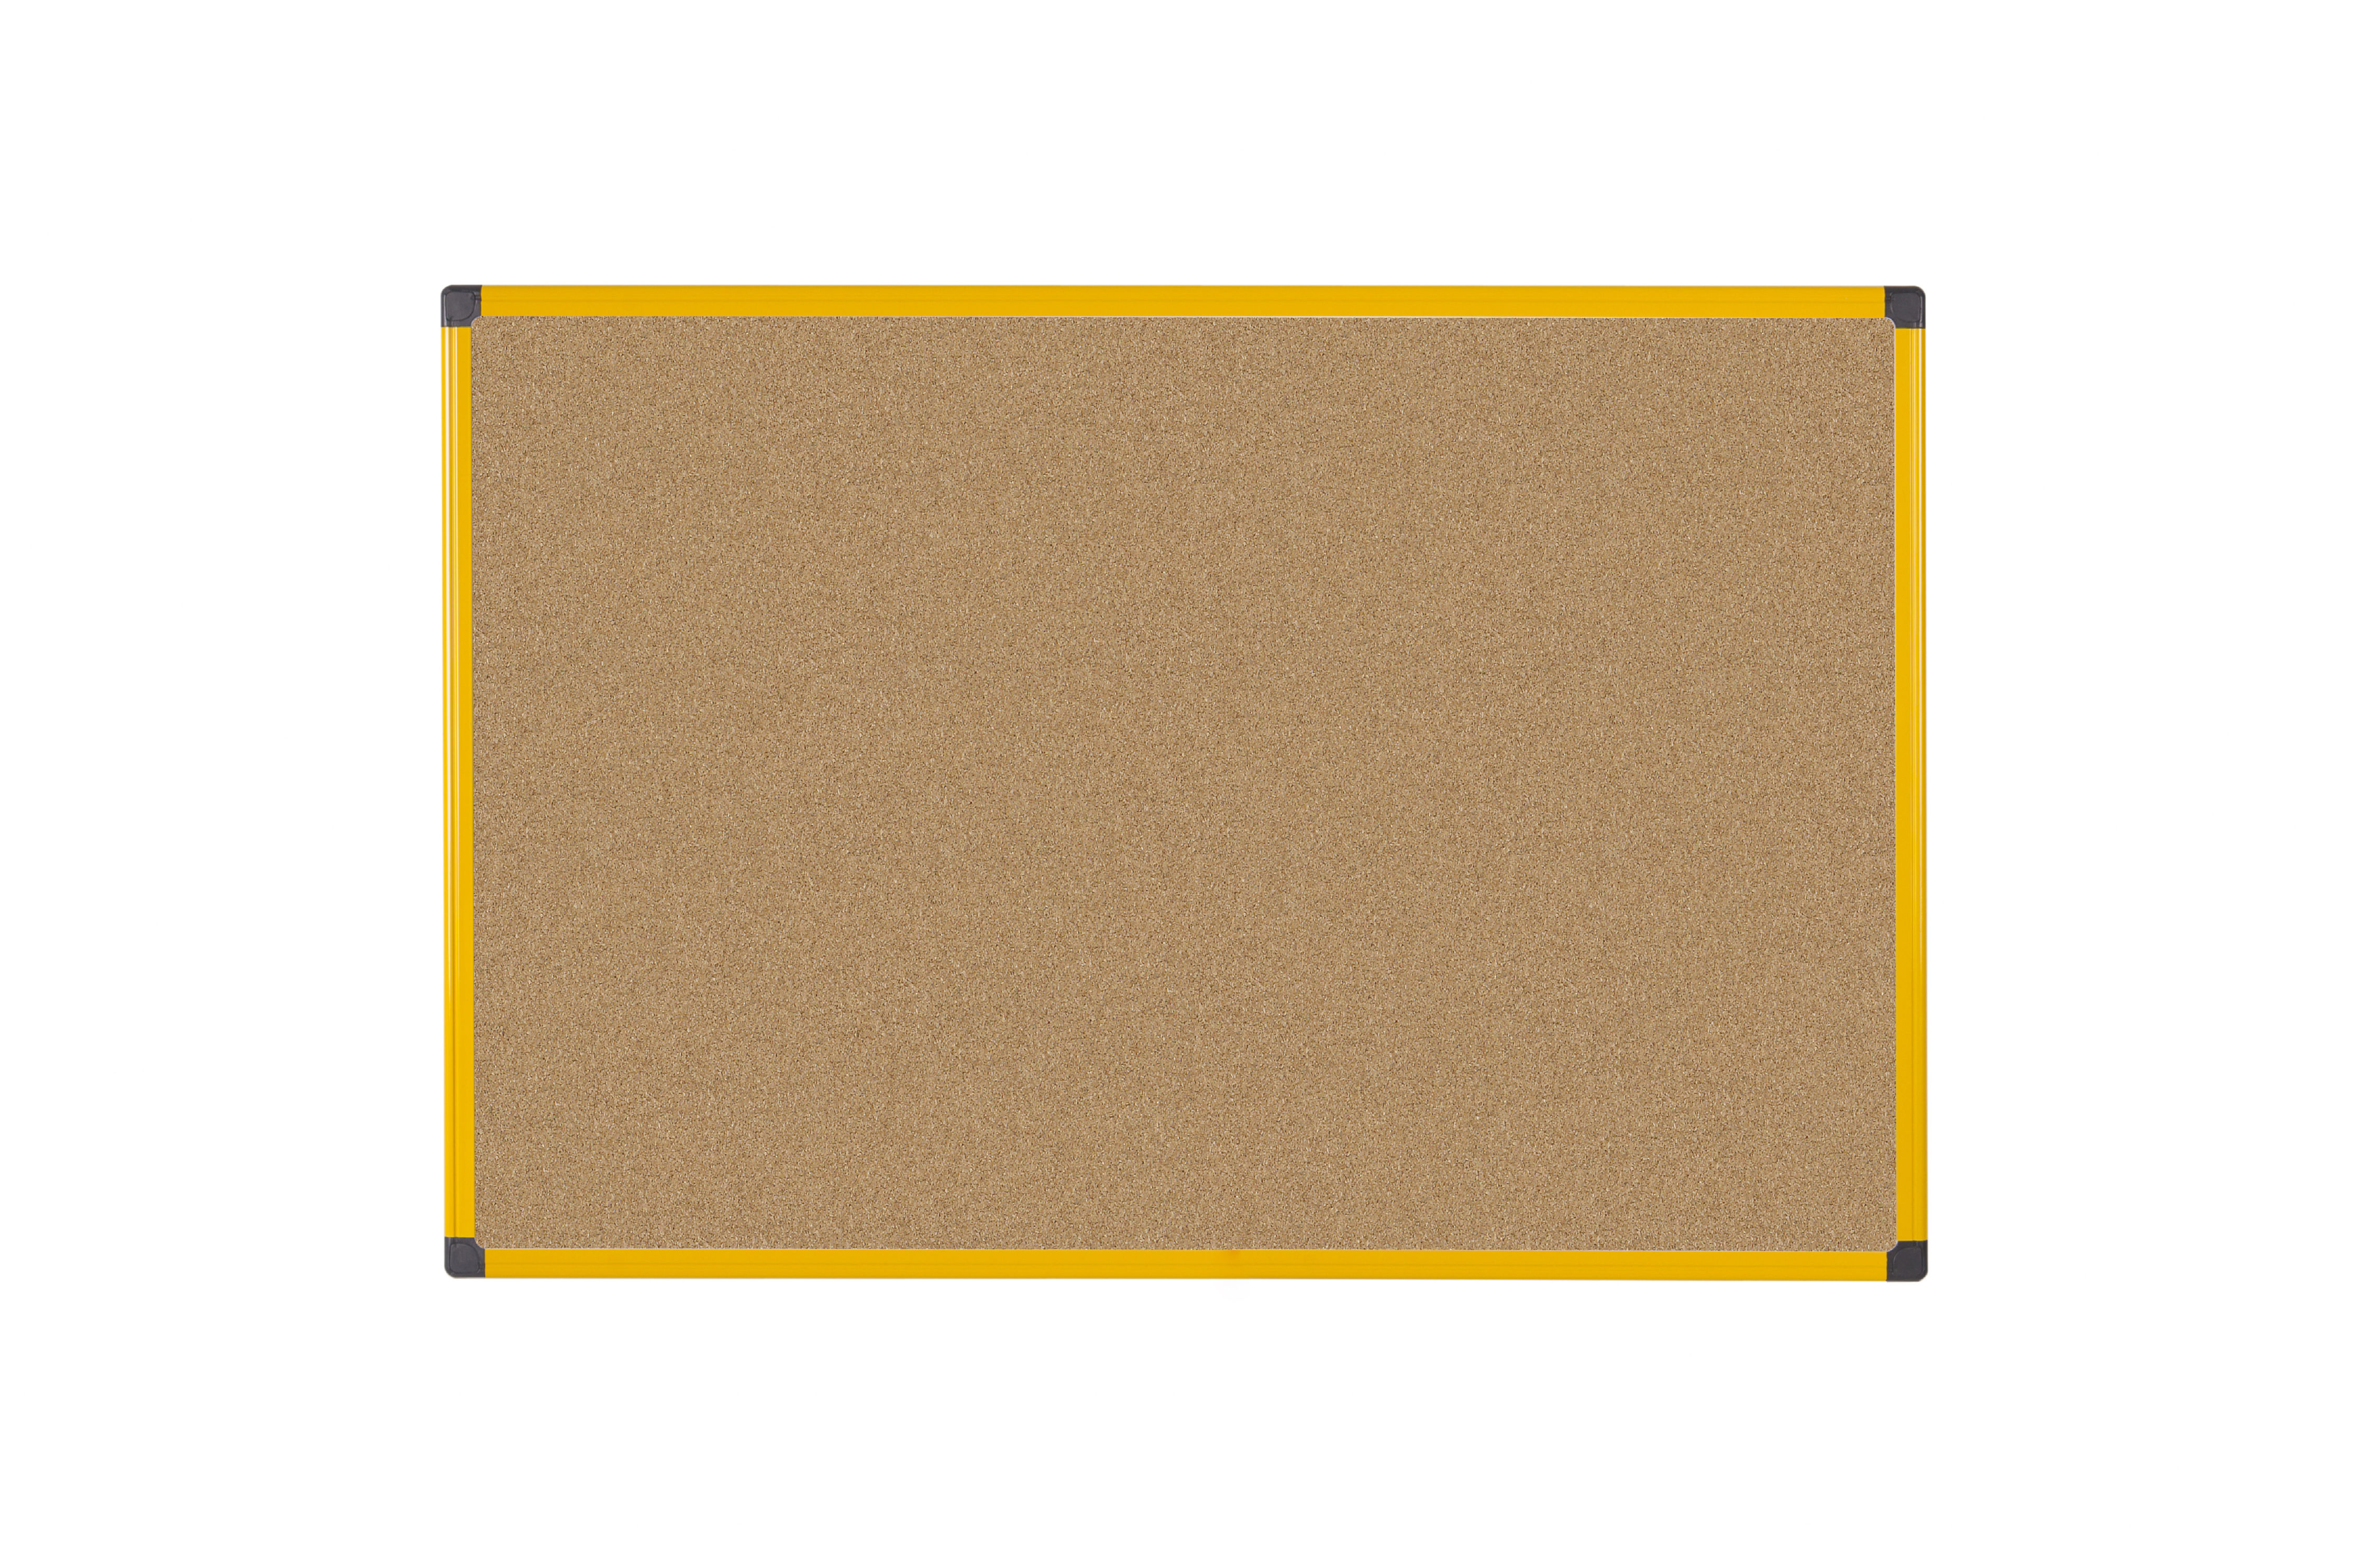 Cork Bi-Office Ultrabrite Cork Noticeboard Yellow Aluminium Frame 600x900mm